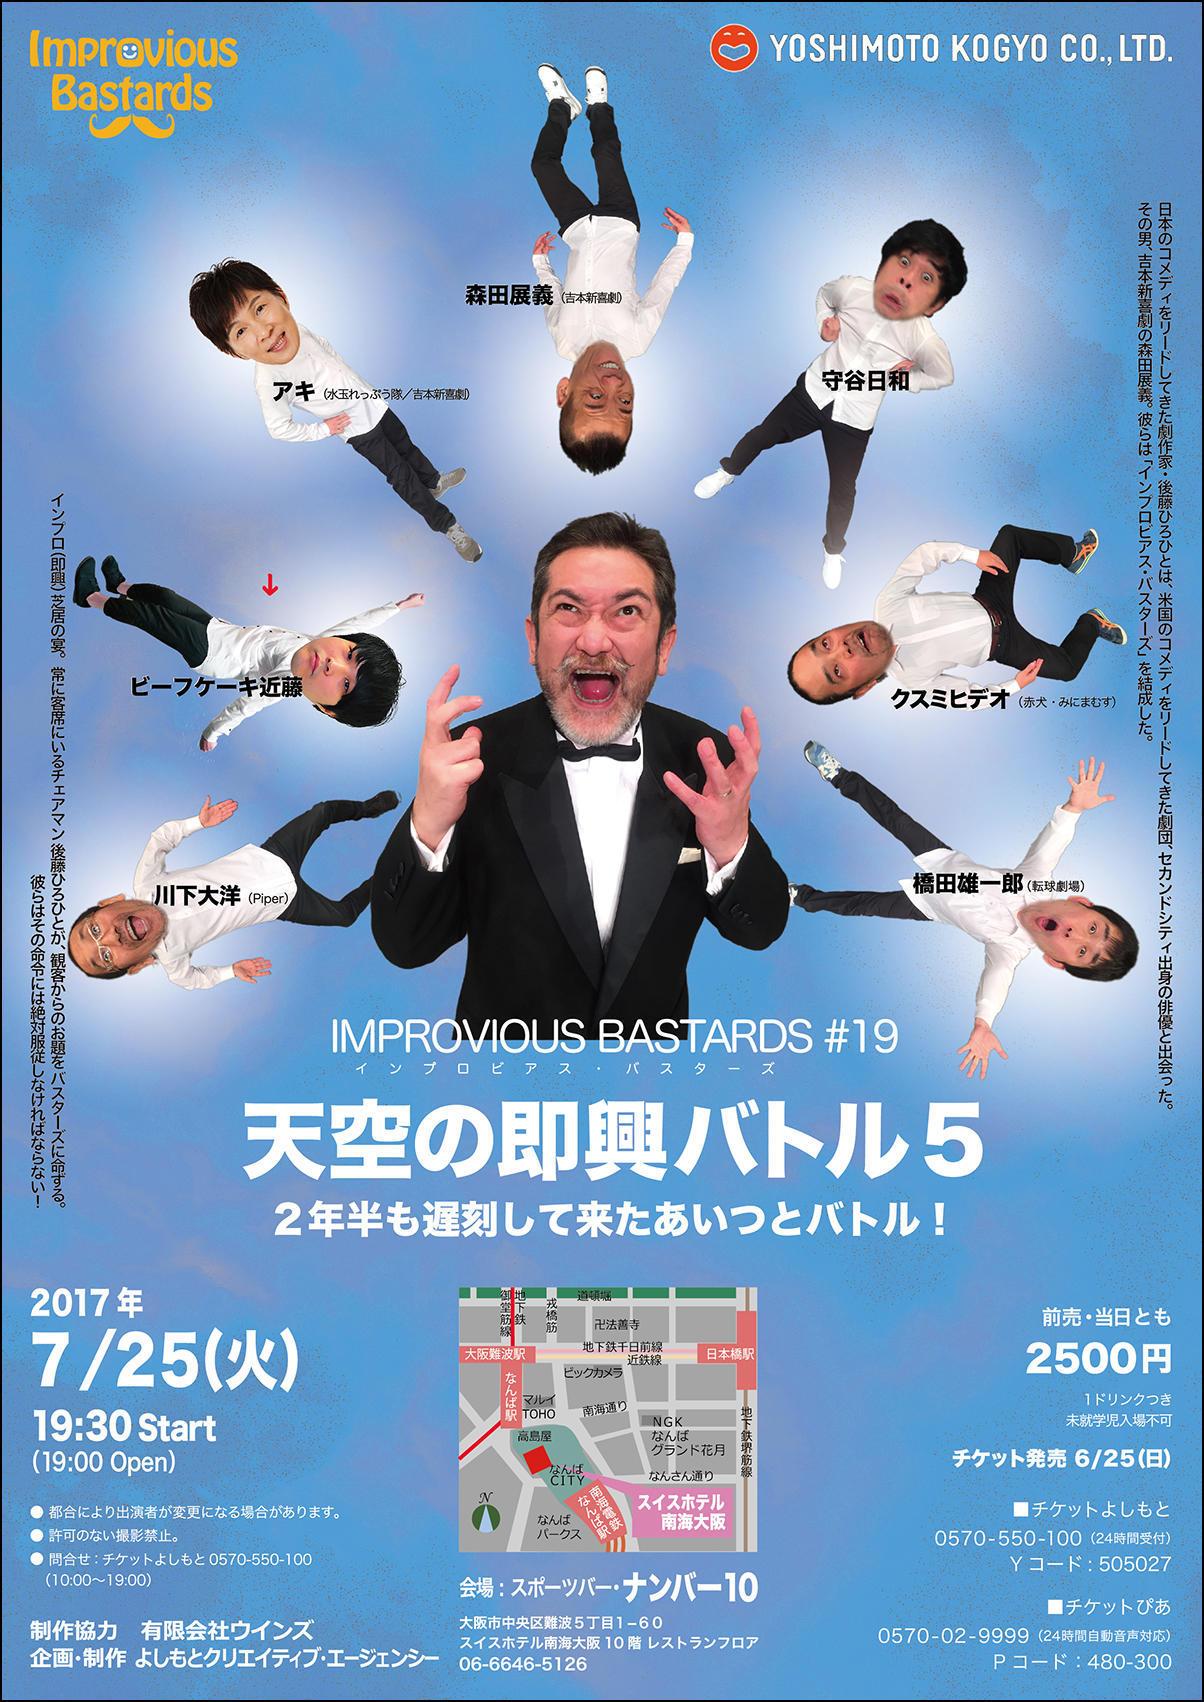 http://www.syumatsu.jp/20170627182418-28b70dd7866838ee3aa21924ab421b6c630c6dee.jpg